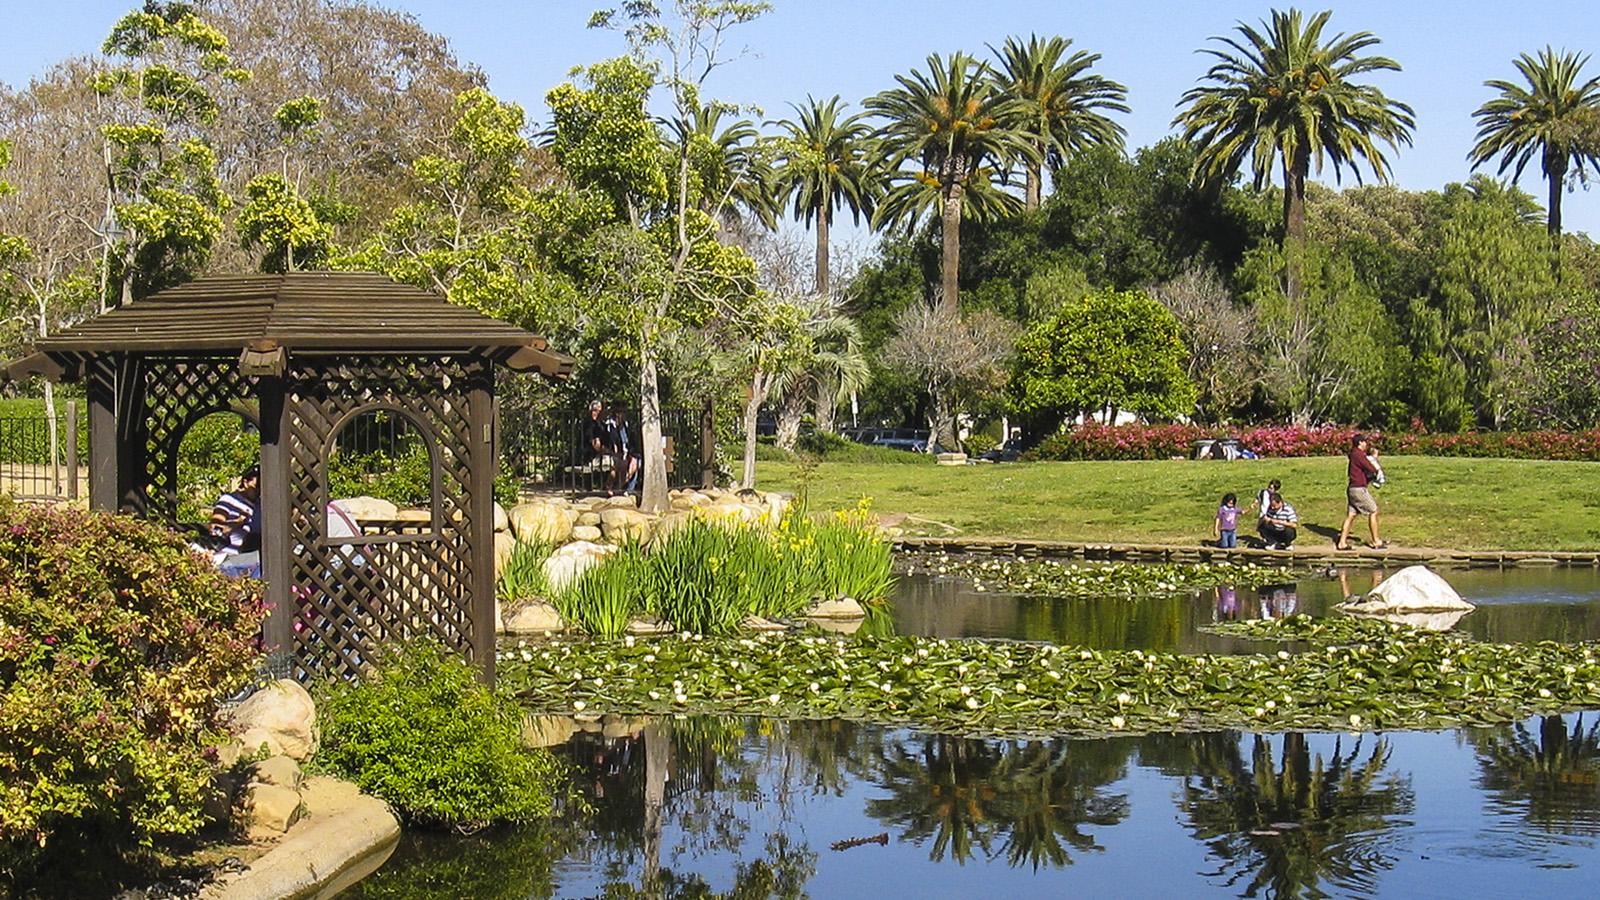 CA - SF and Santa Barbara 04-2009_121_Signature.jpg